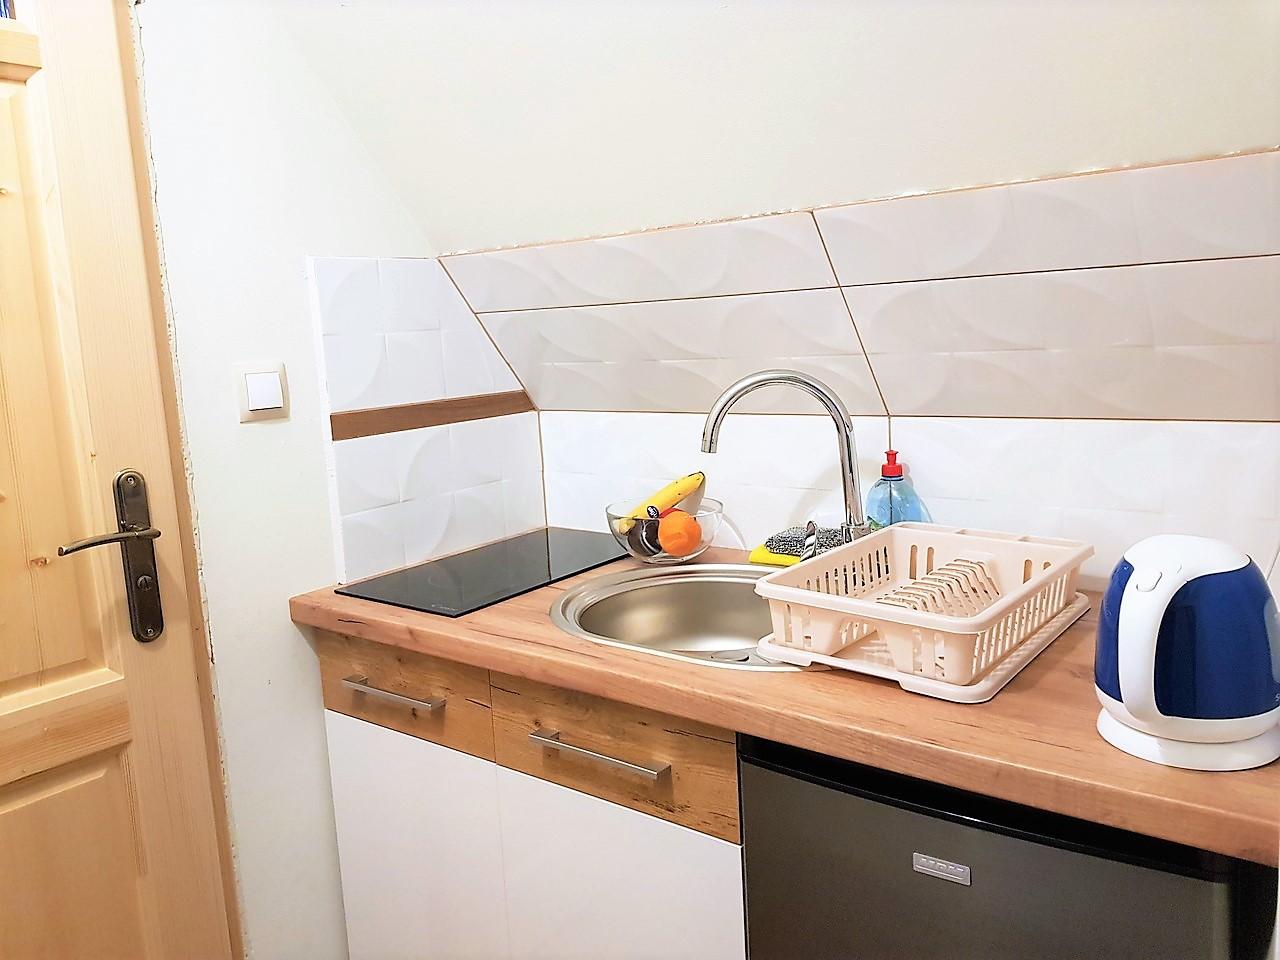 pokoje zakopane 5 aneks kuchenny (2)